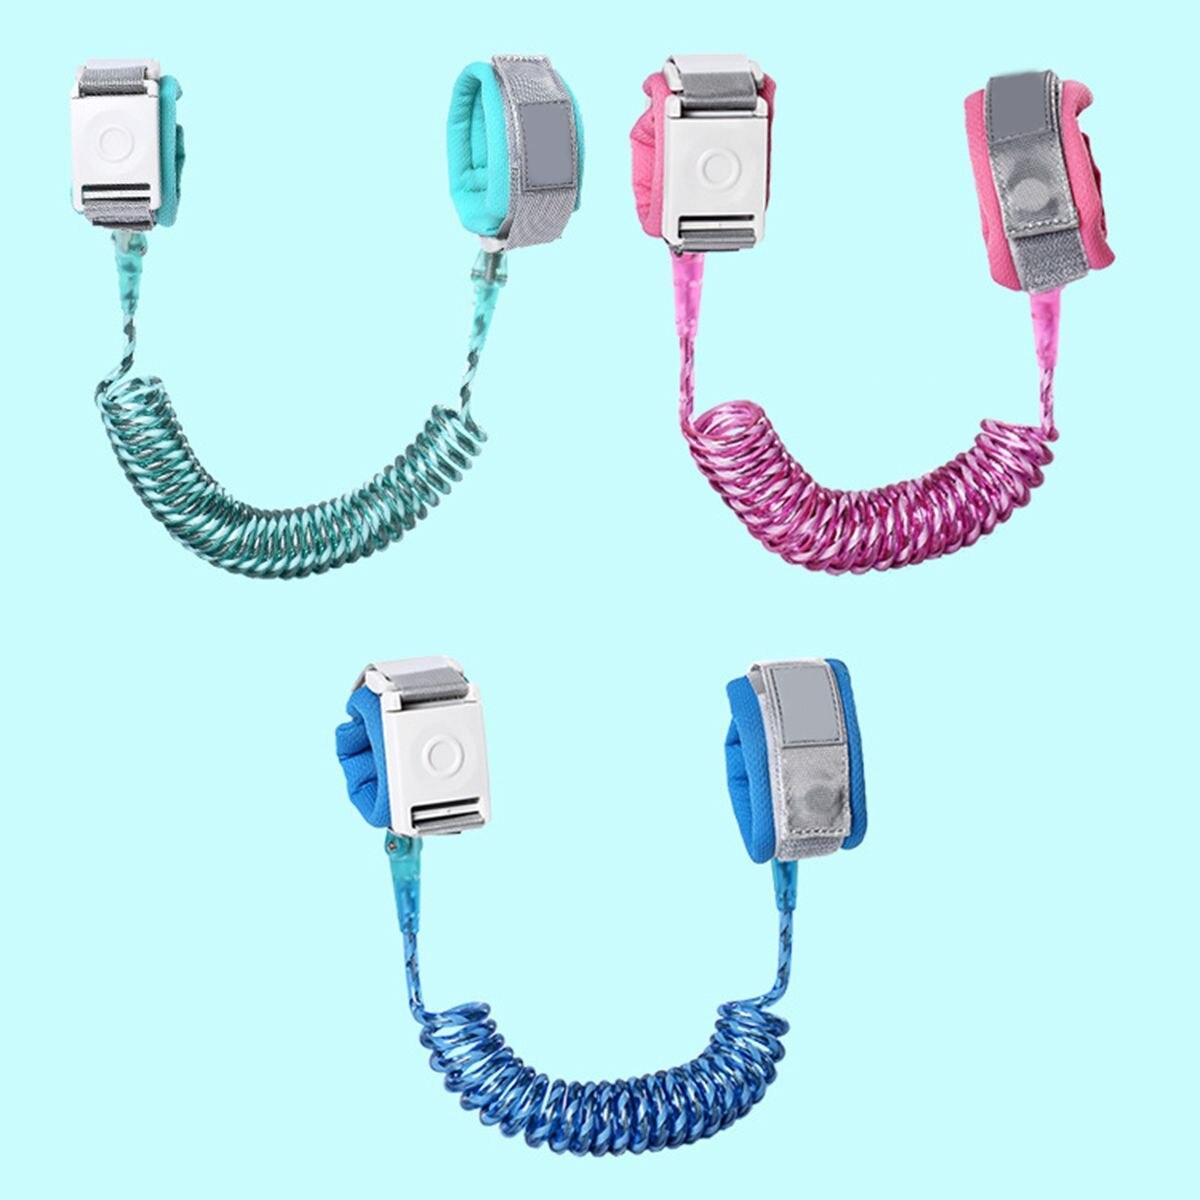 1.8M / 2.5M Anti-Lost Induction Lock Leash Safety Harness Strap Wrist Link Children Toddlers Walking Hand Belt